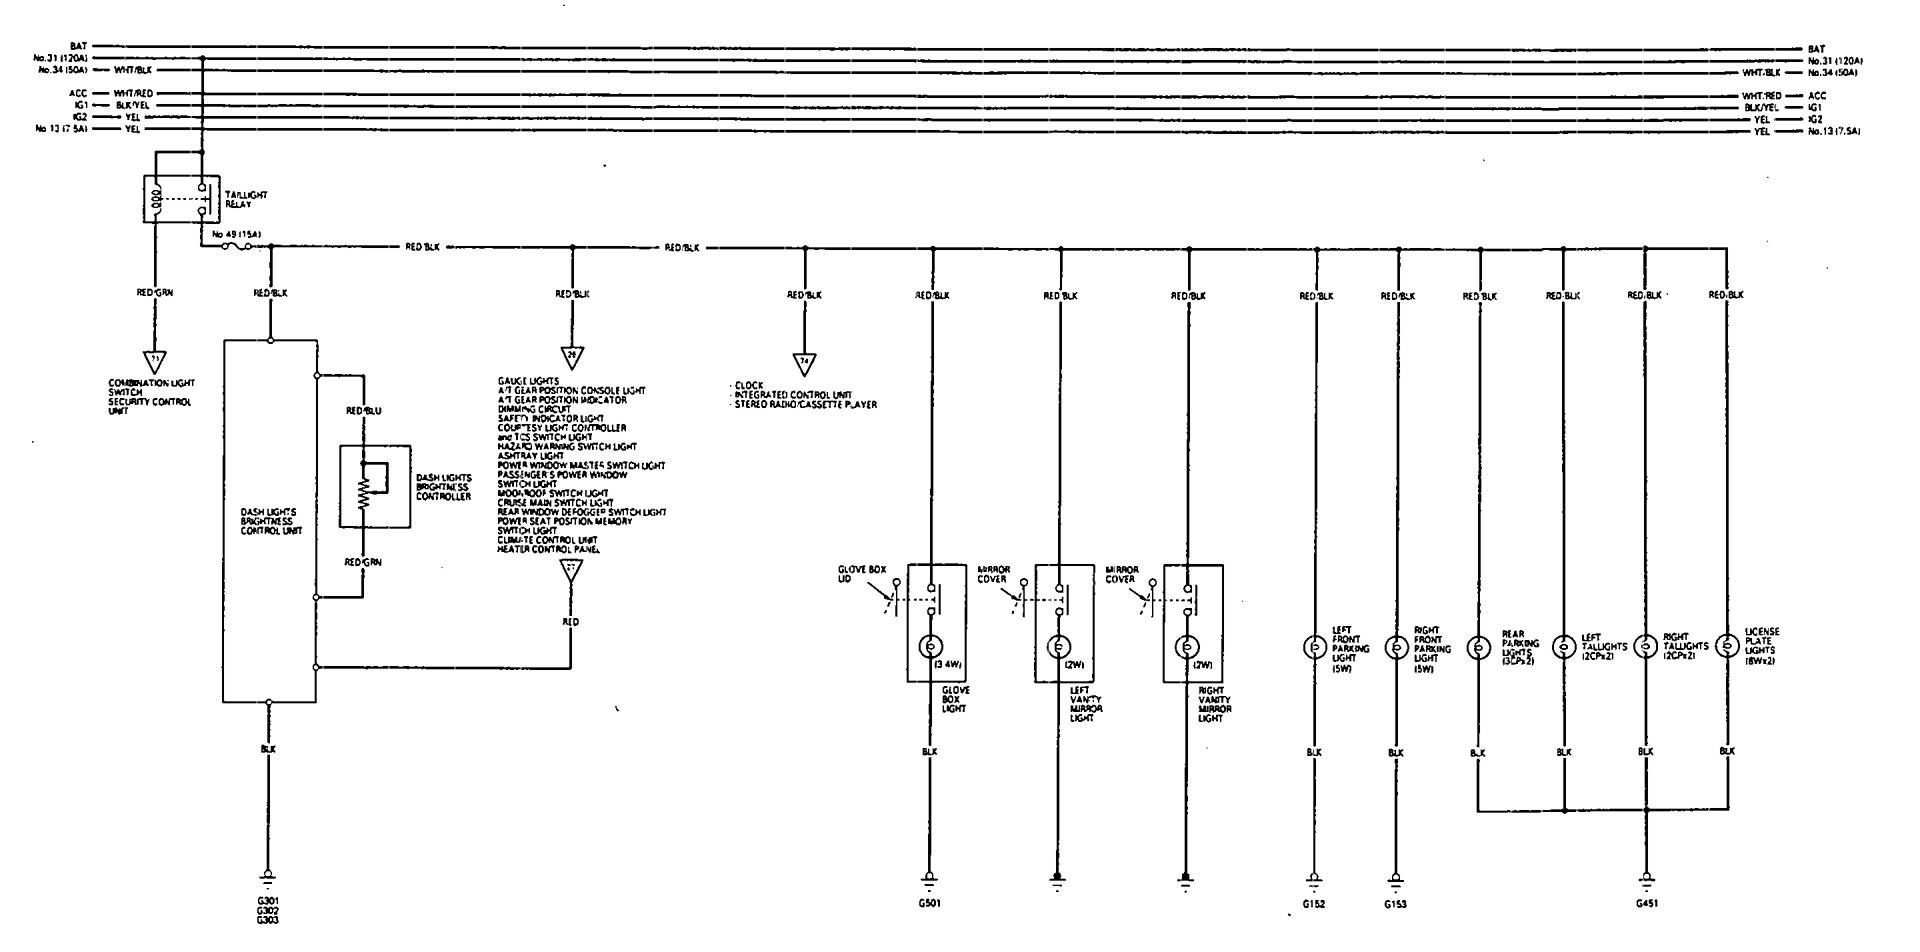 Acura Legend  1993  - Wiring Diagram - Parking Lamp